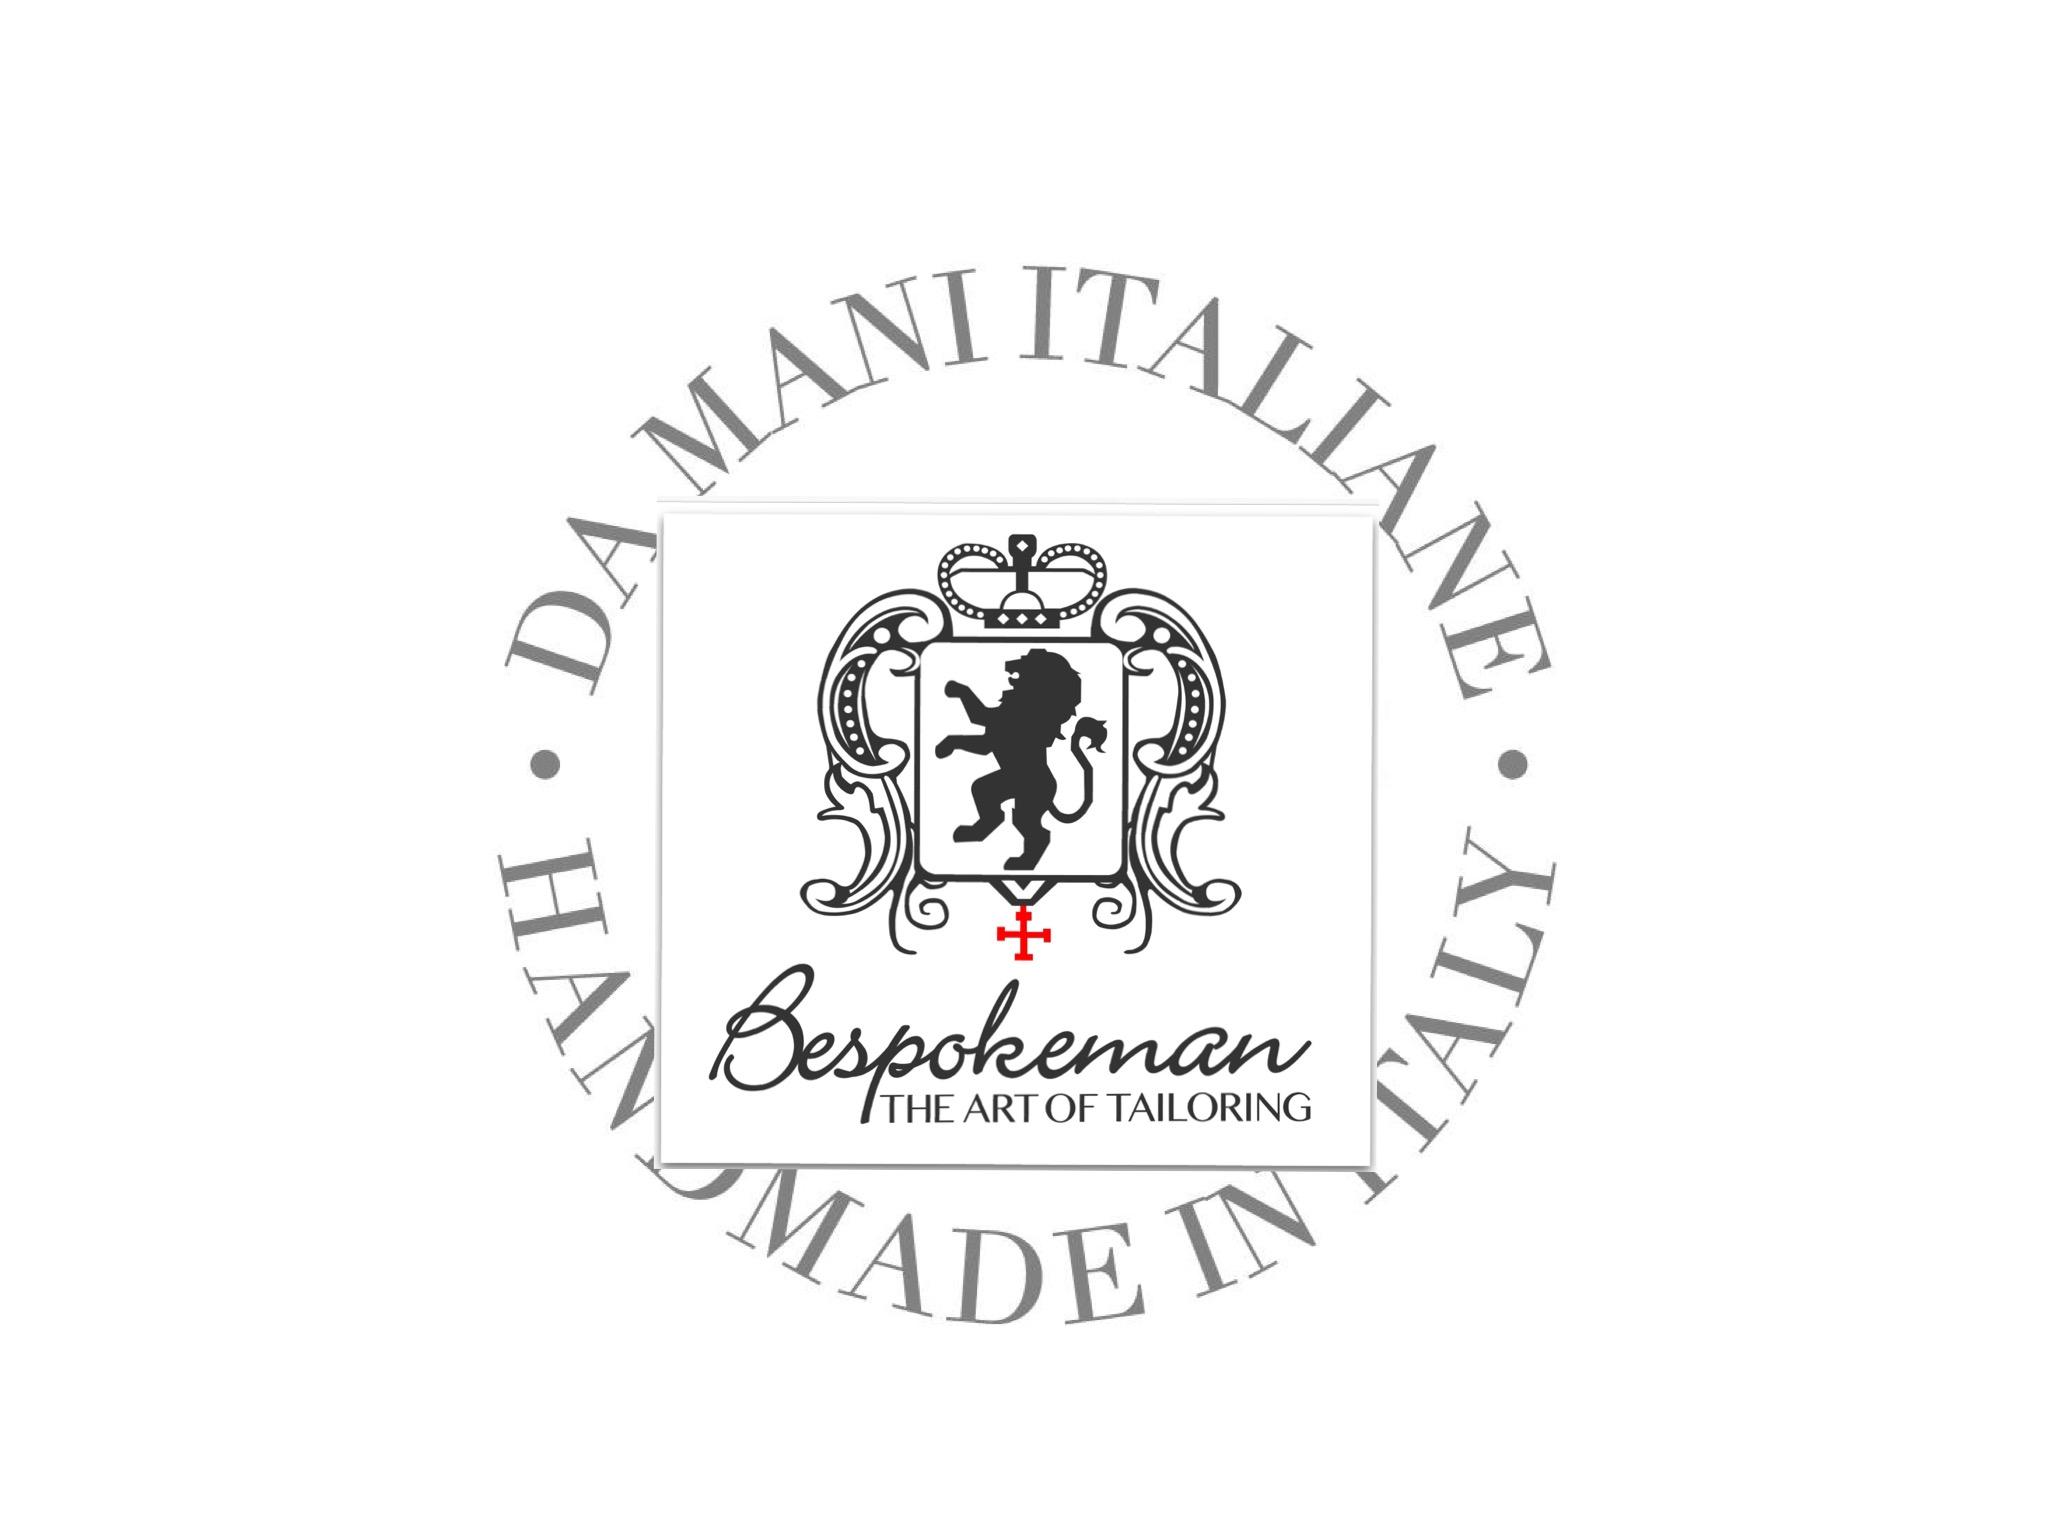 #suits #bespoketailoring #customtailored #madetomeasure #handmadesuits #GQstyle #sartorial #italiandesigners #menwithstyle #sharpmagazine